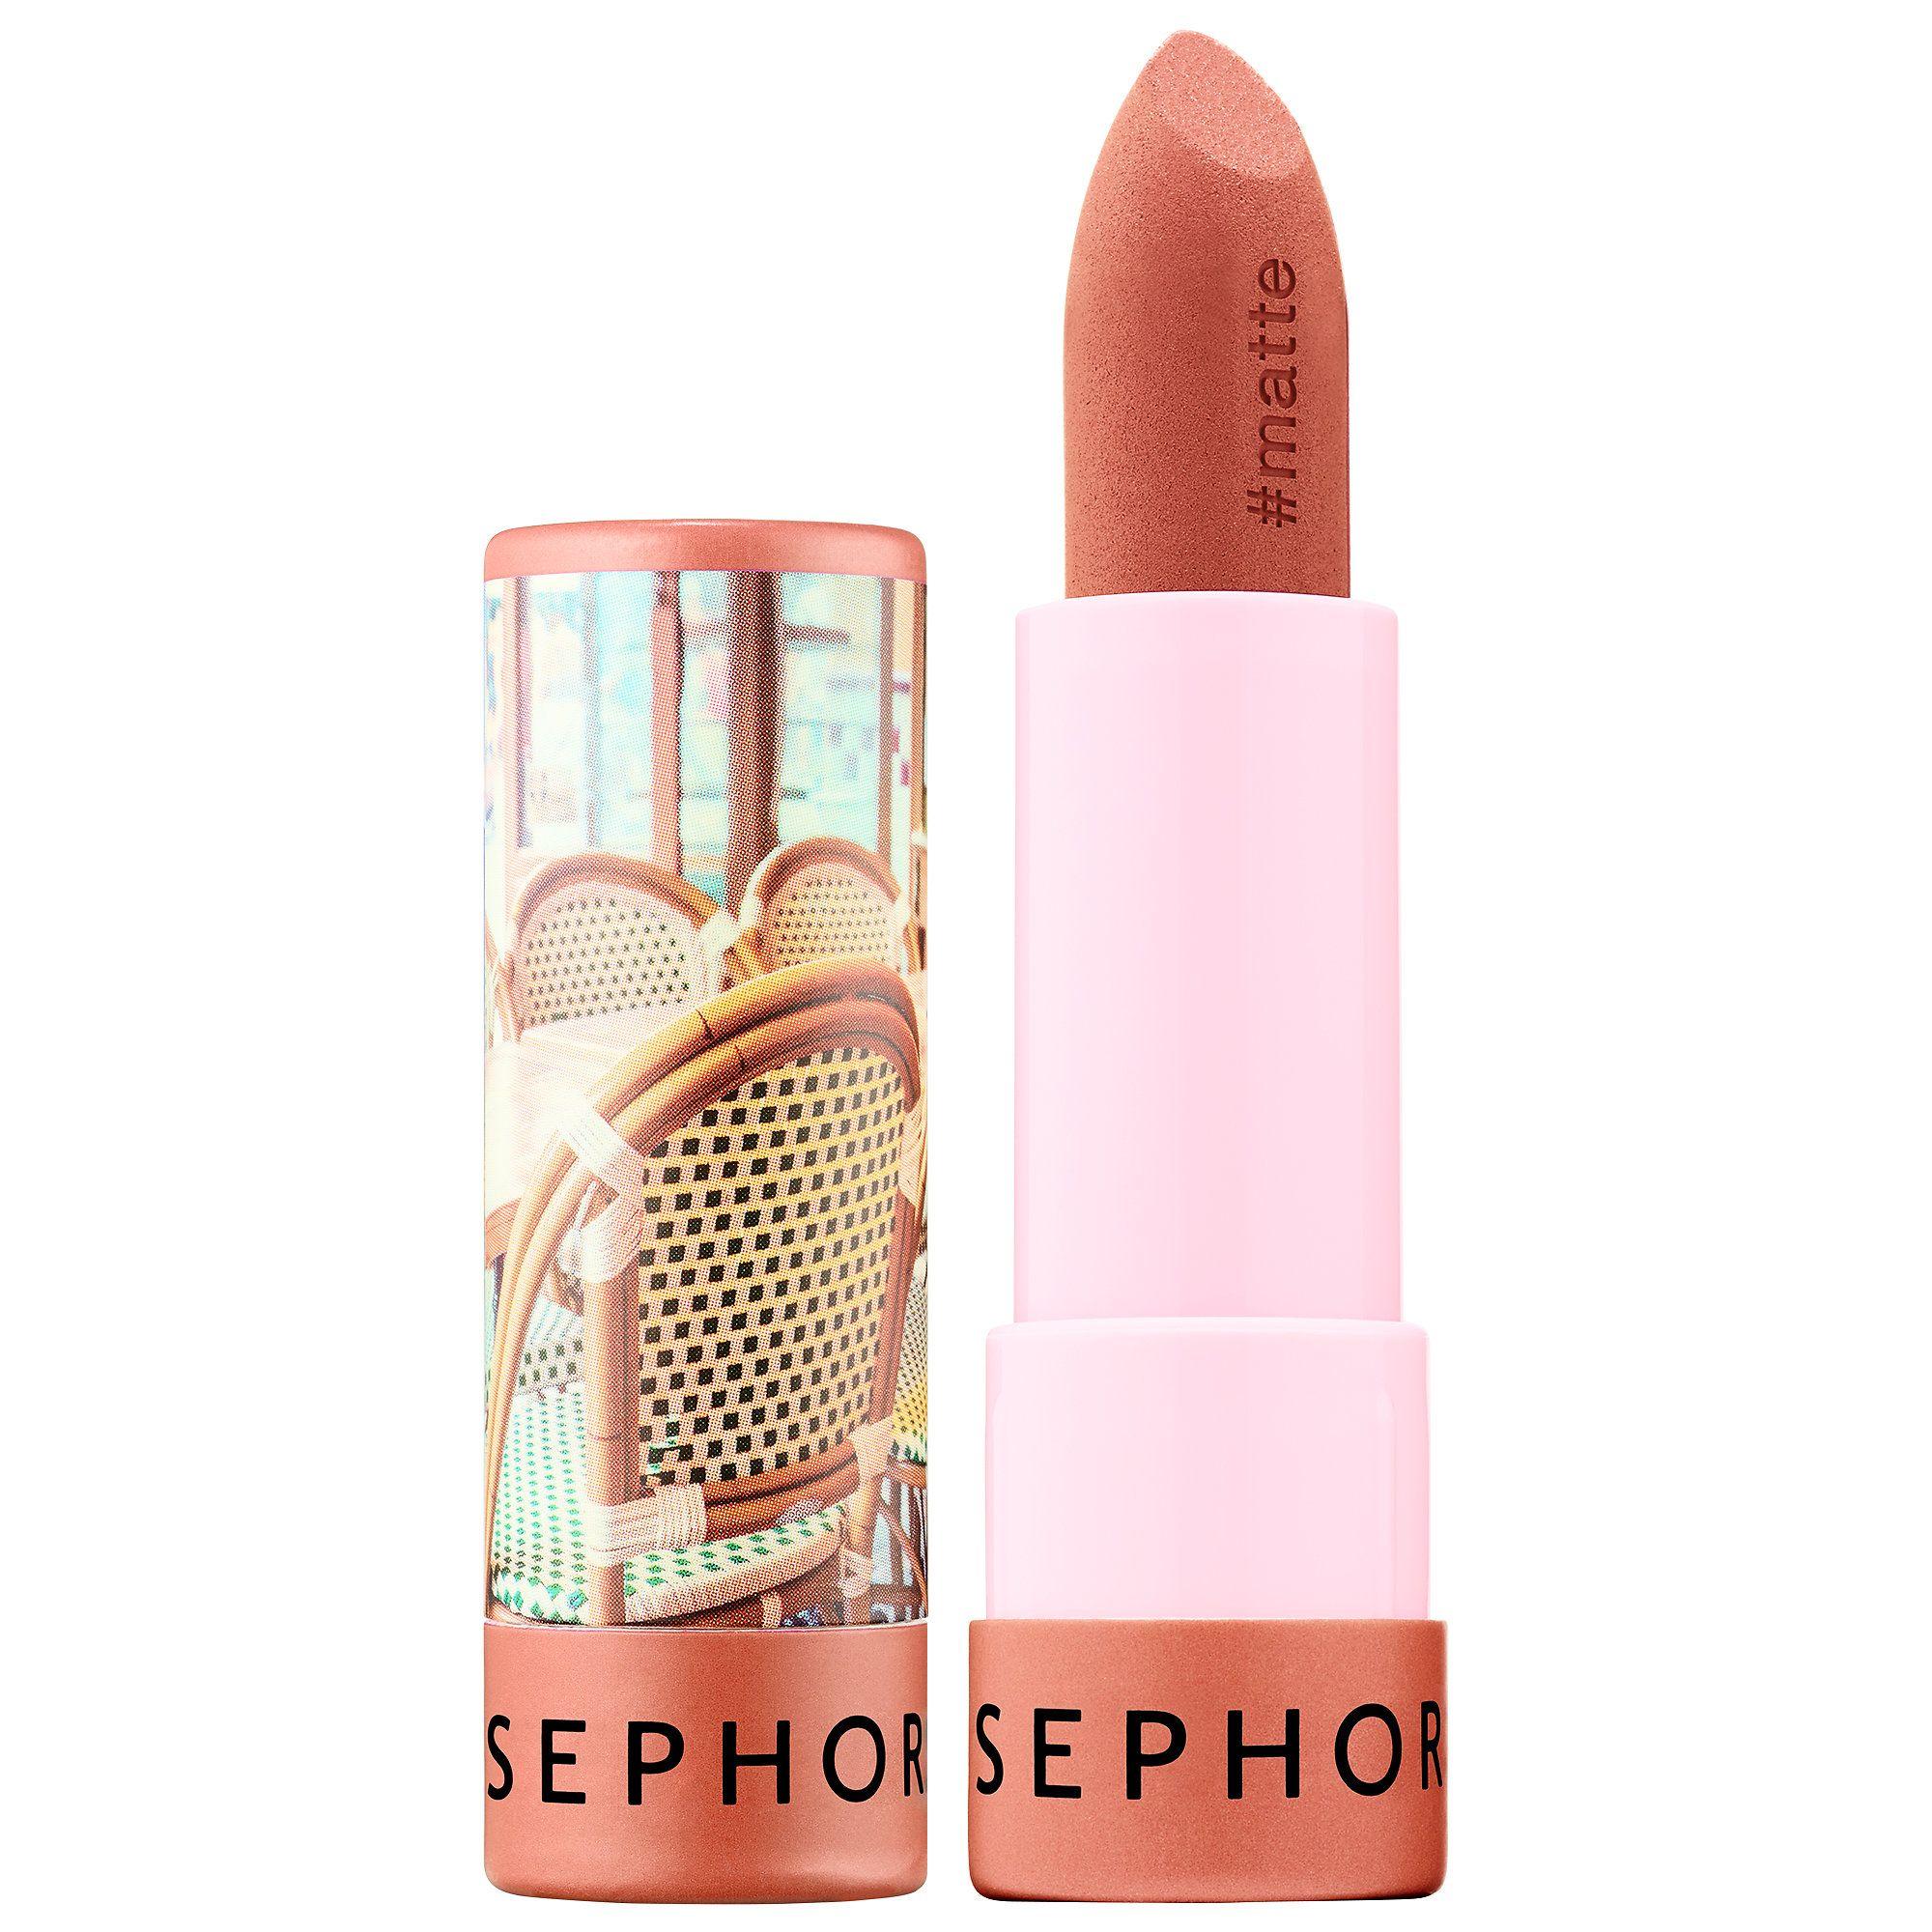 Sephora Just Launched a Line of Super AffordableLipsticks